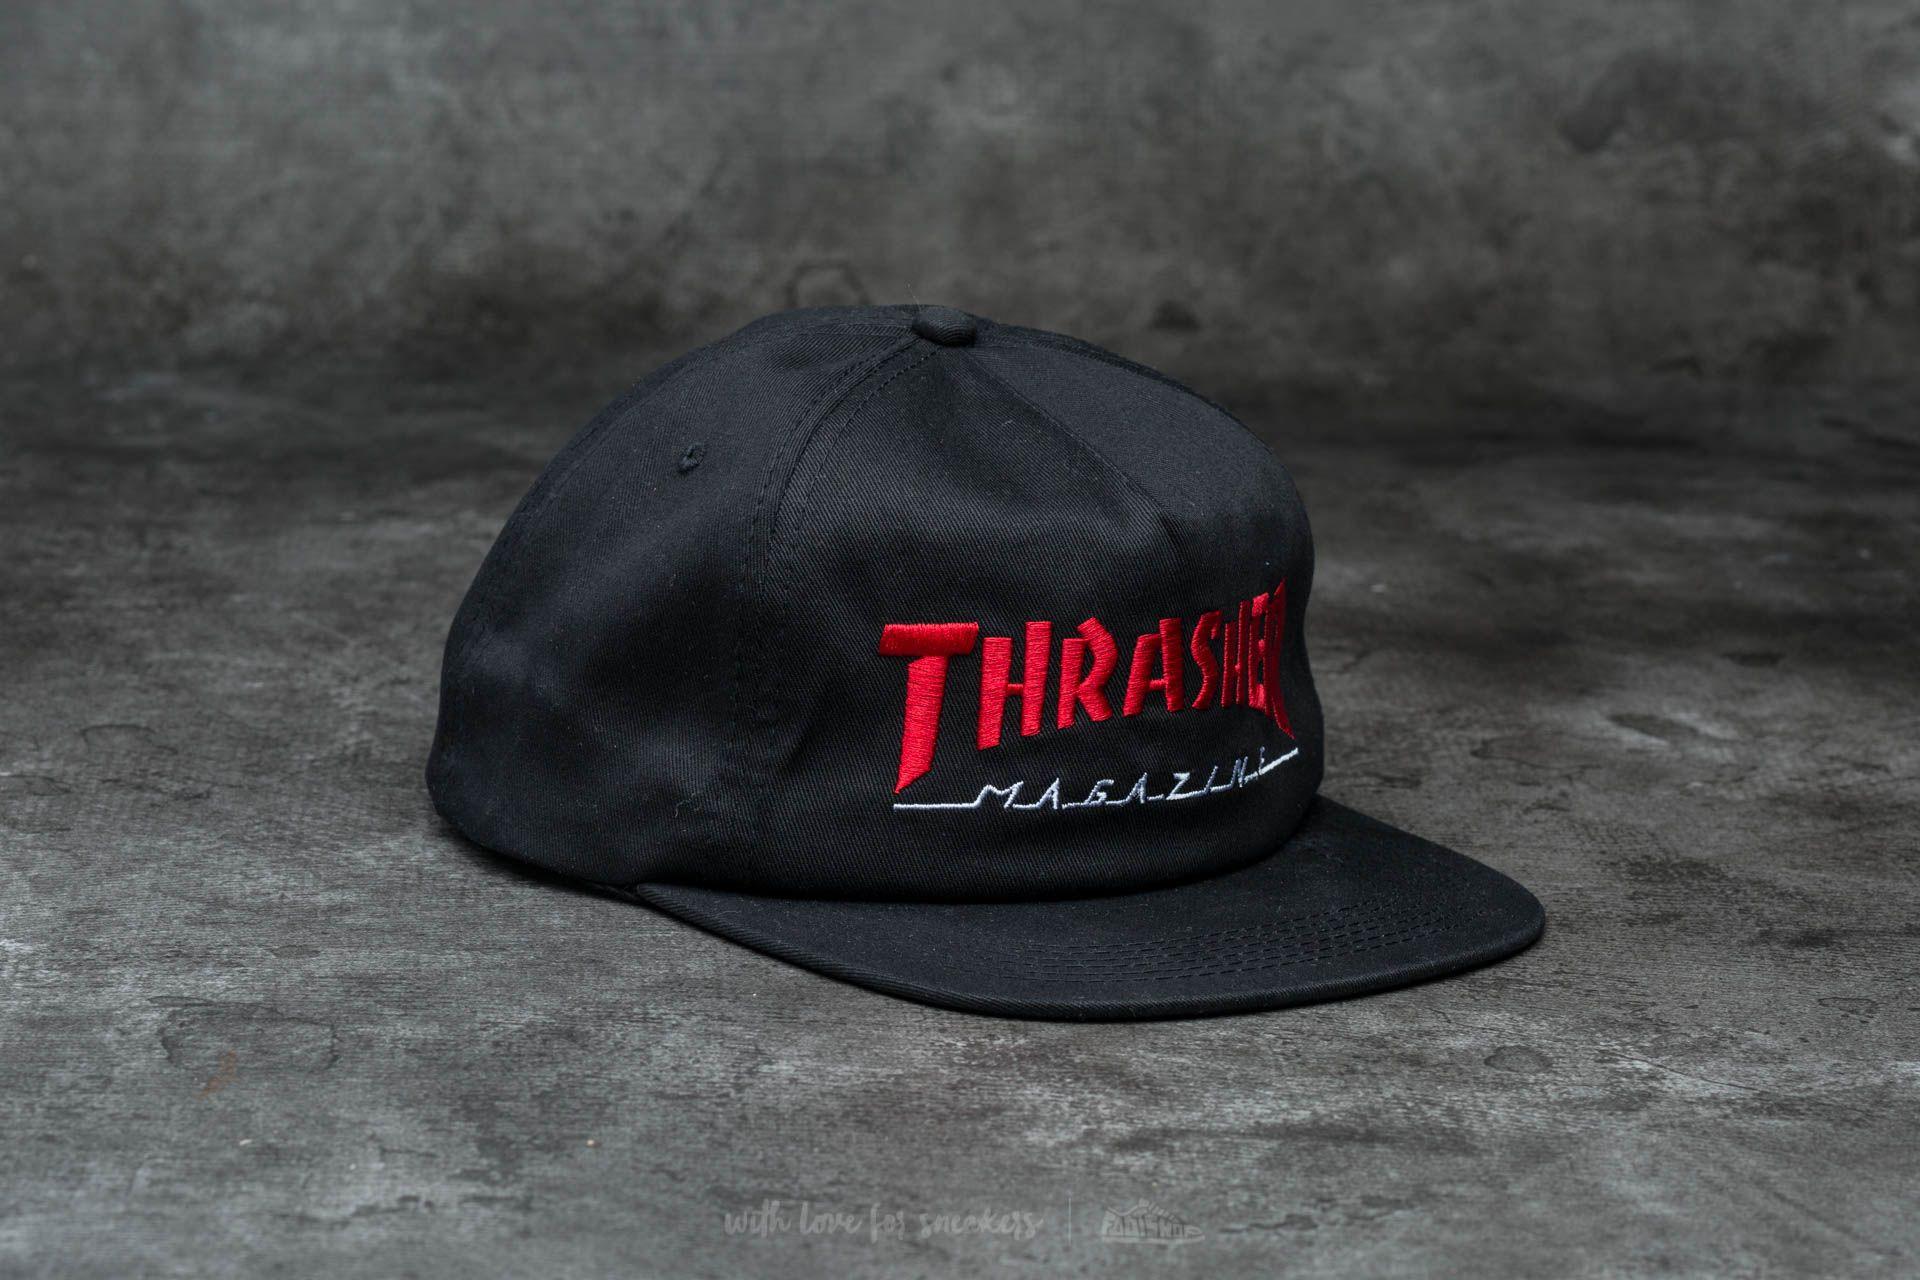 Thrasher Magazine Logo Two-Tone Hat Black/ Red